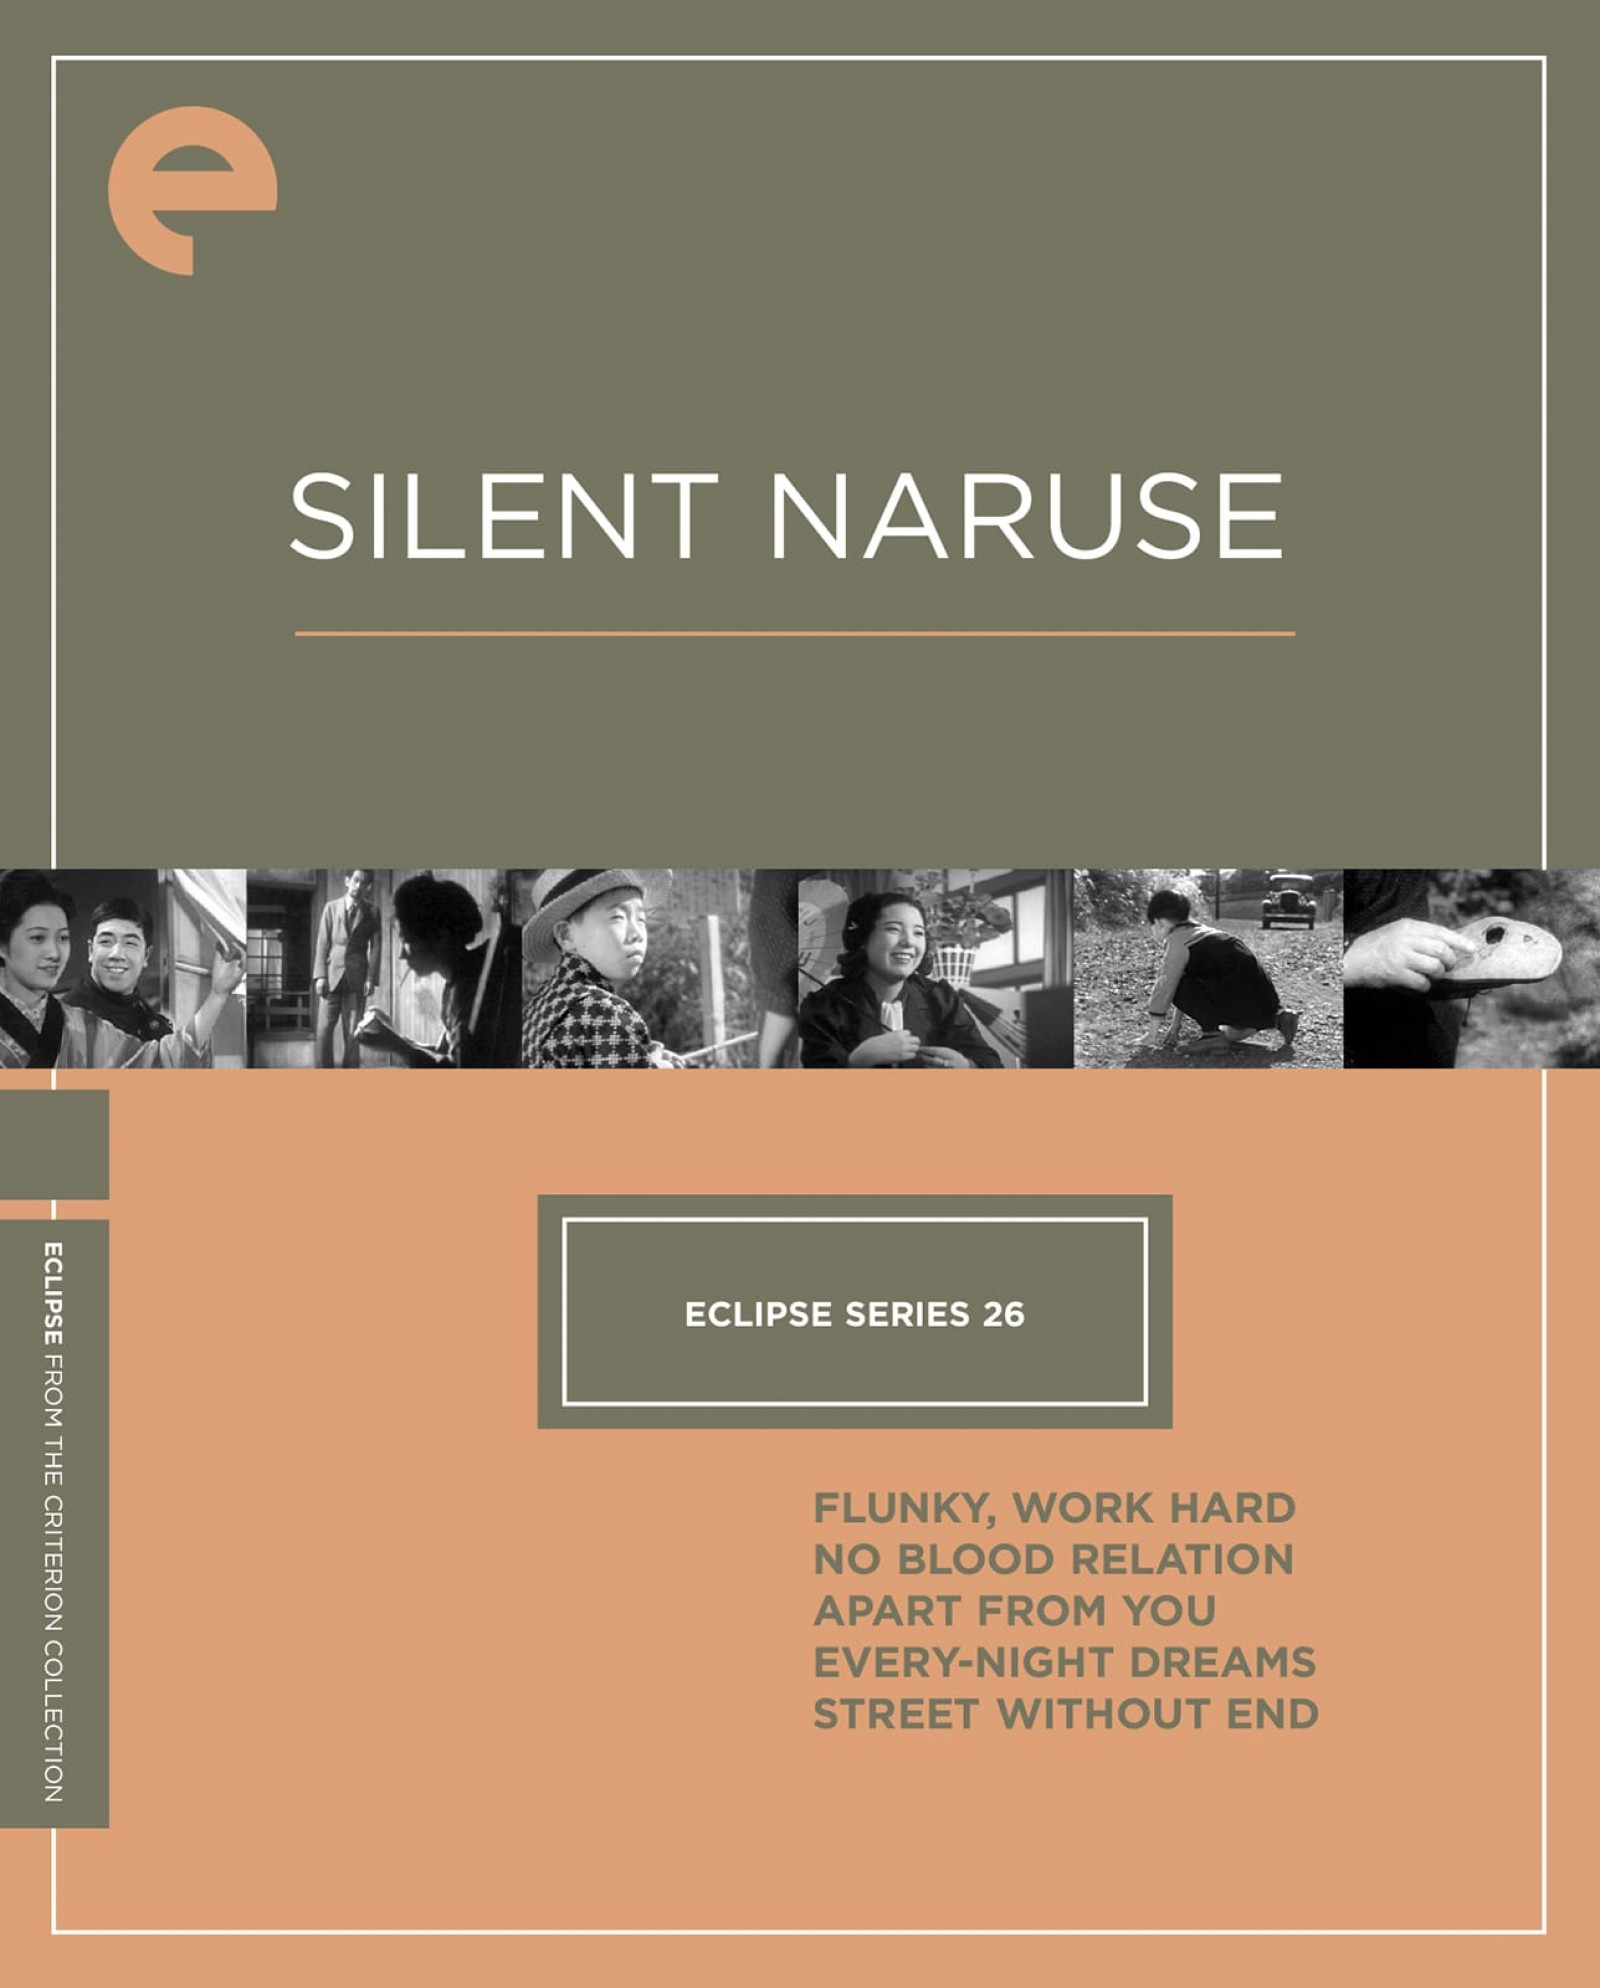 Eclipse Series 26: Silent Naruse